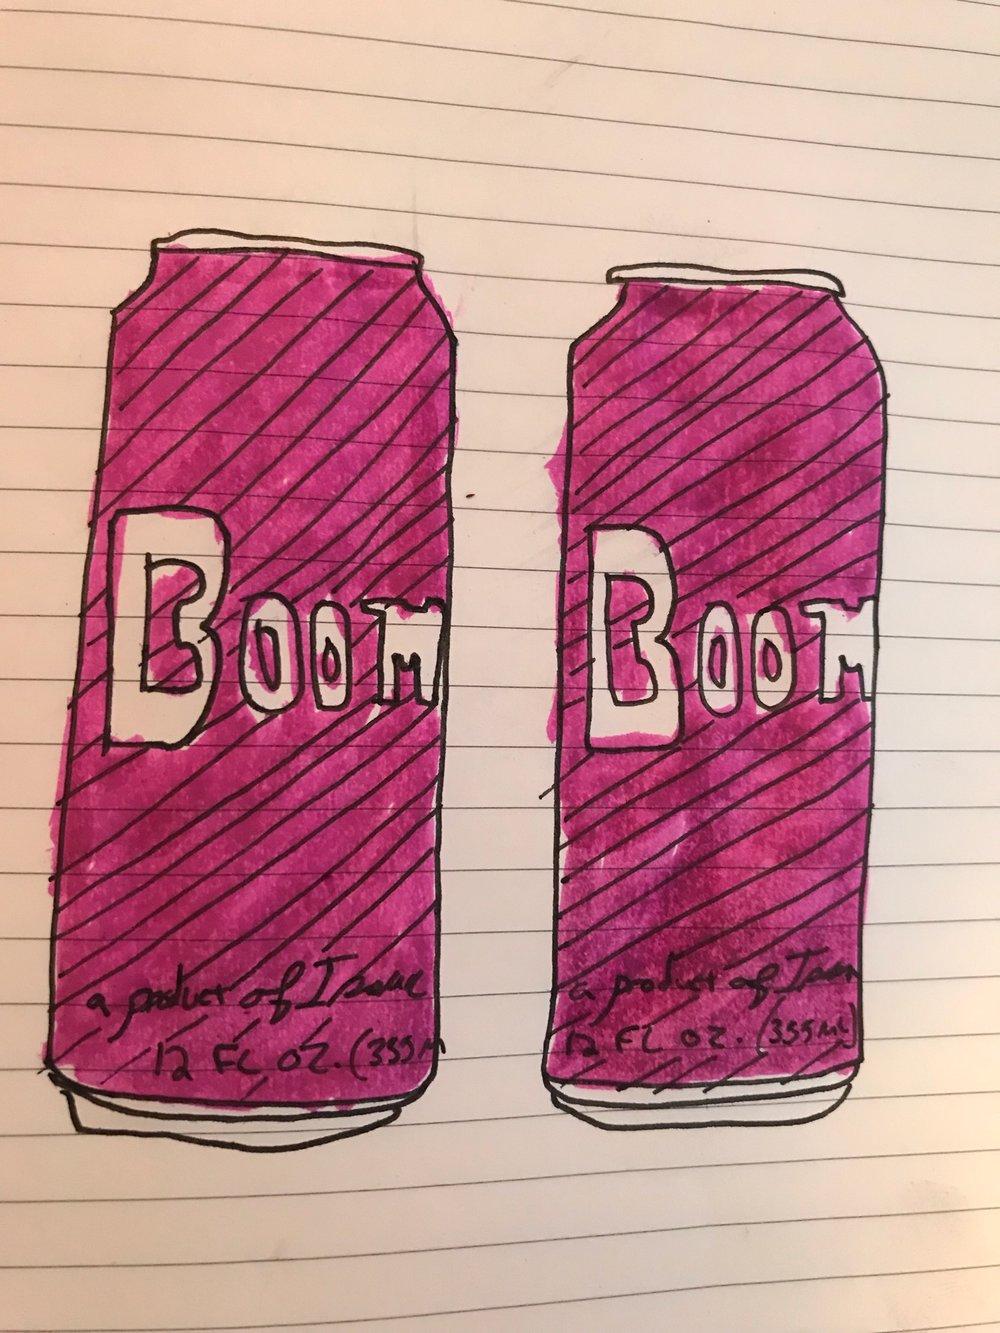 BoomBoomTab.jpg